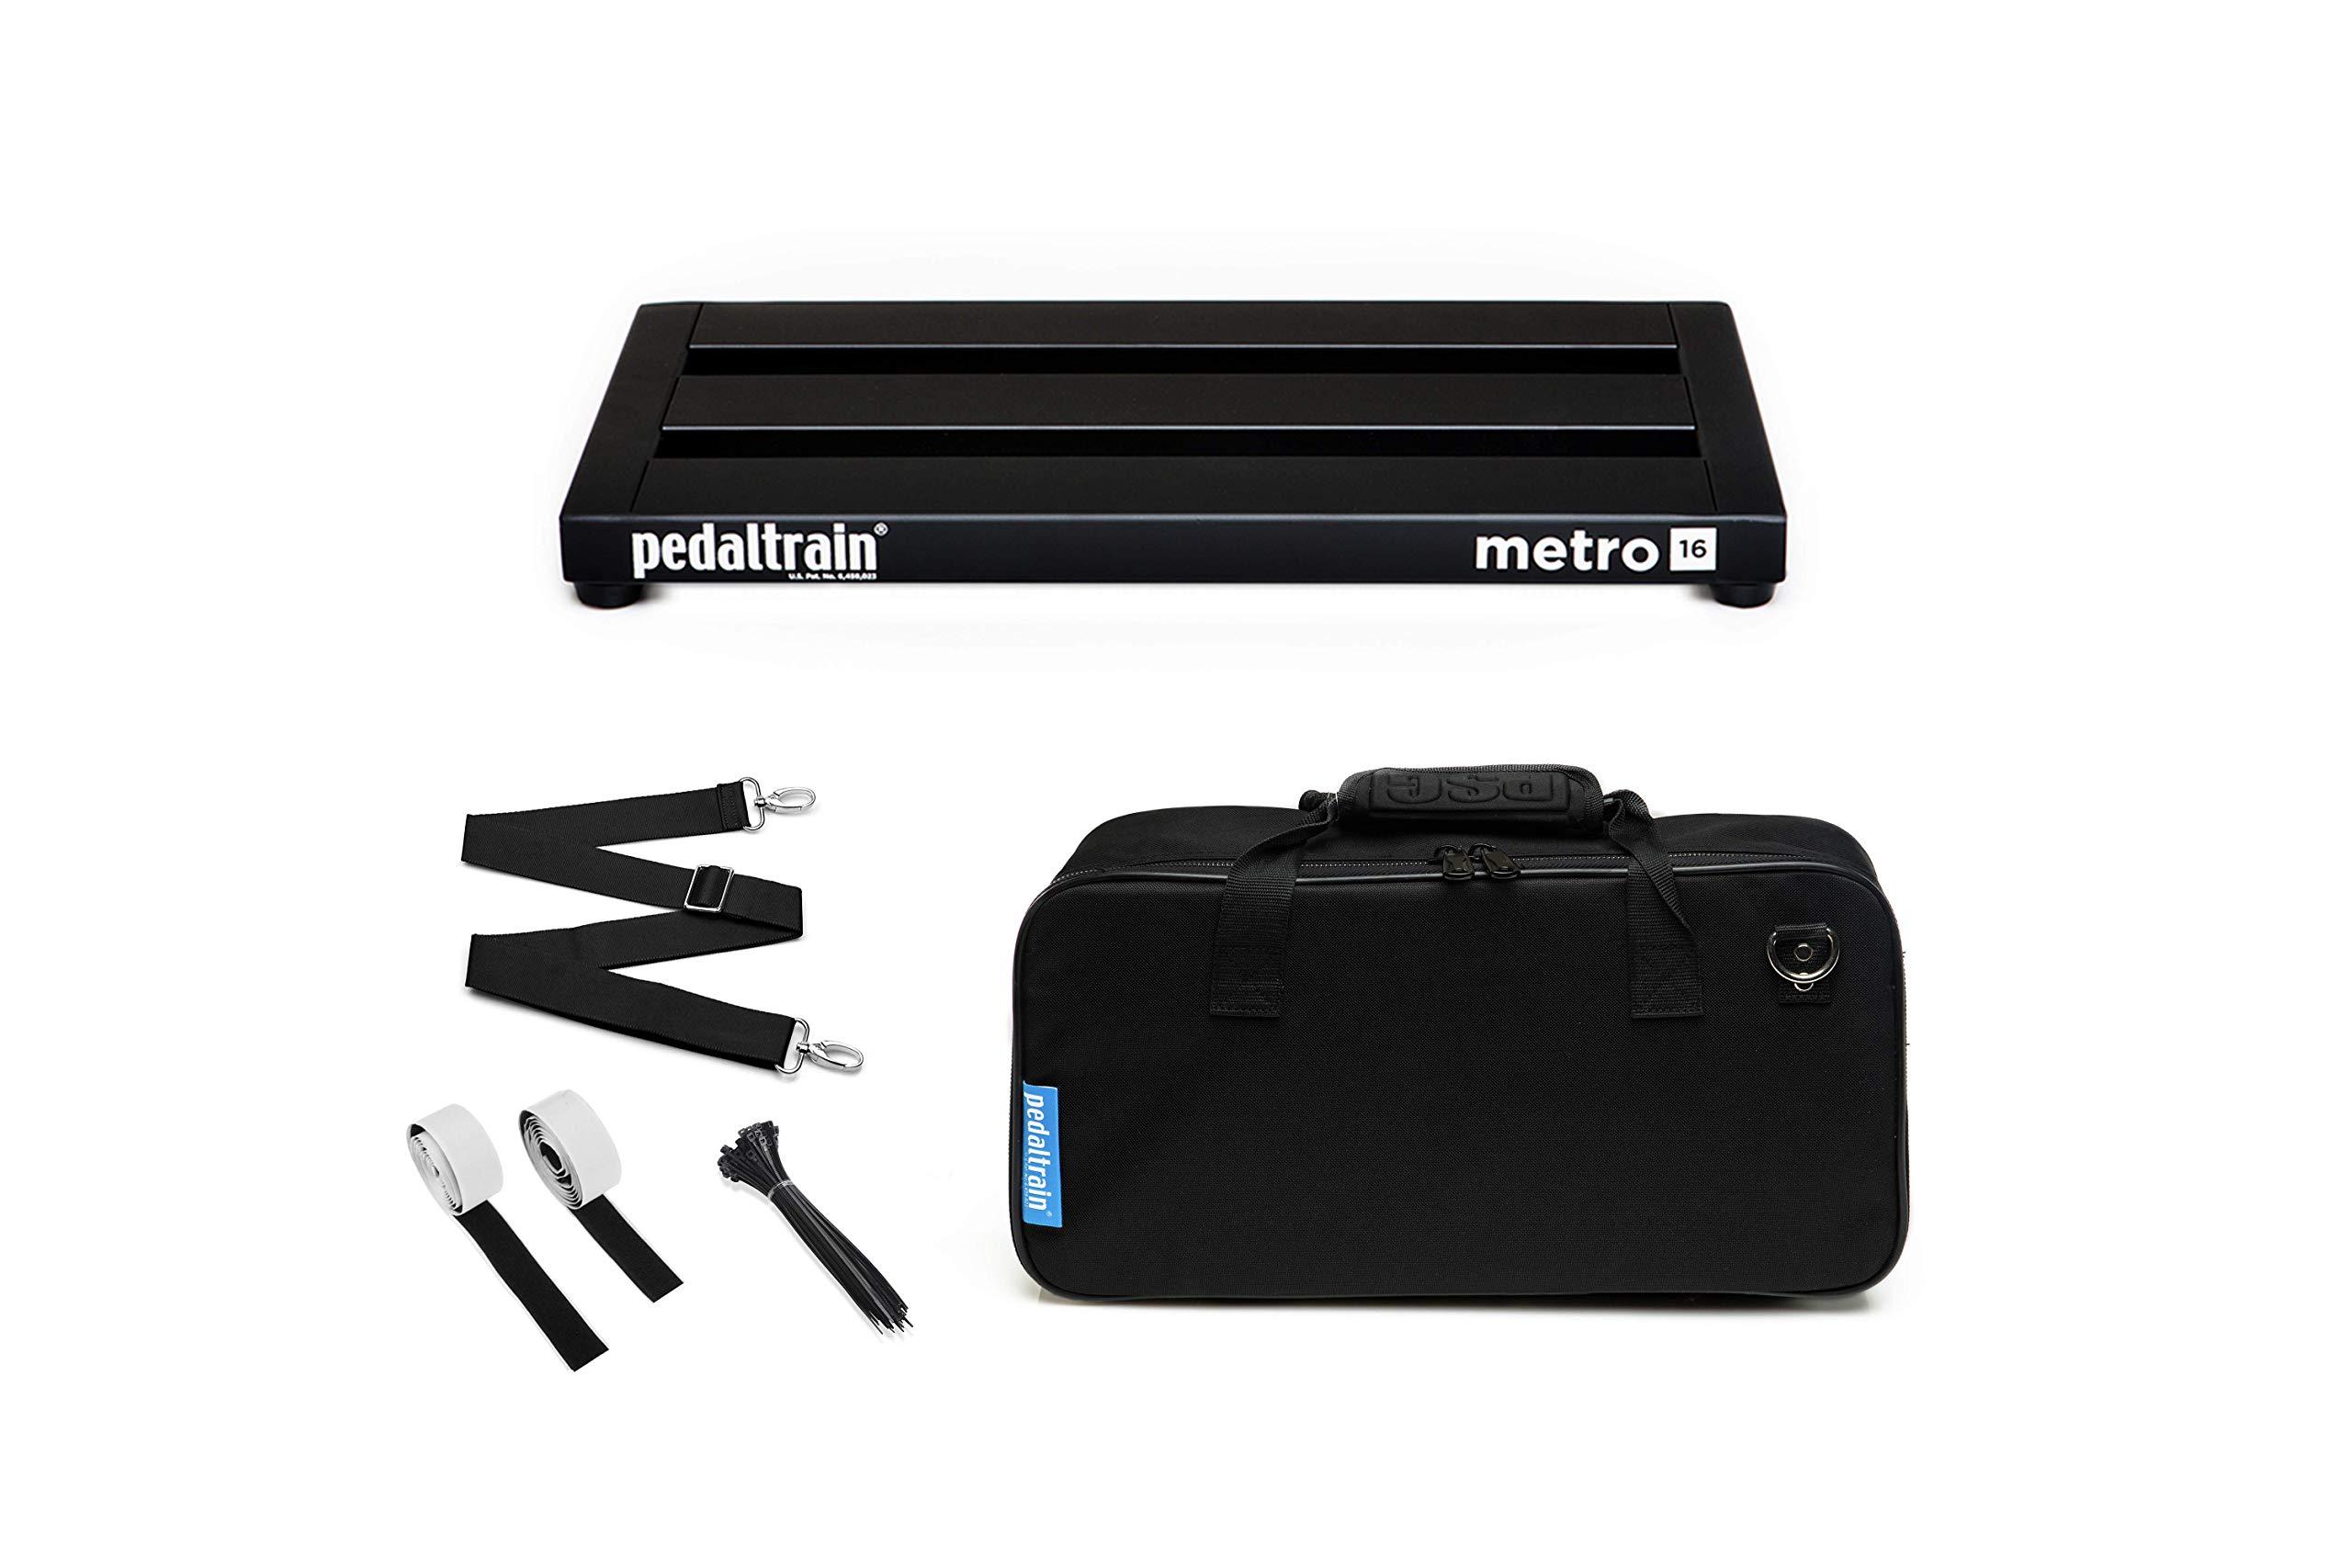 Pedaltrain Metro 16 with Soft Case PT-M16-SC by Pedaltrain